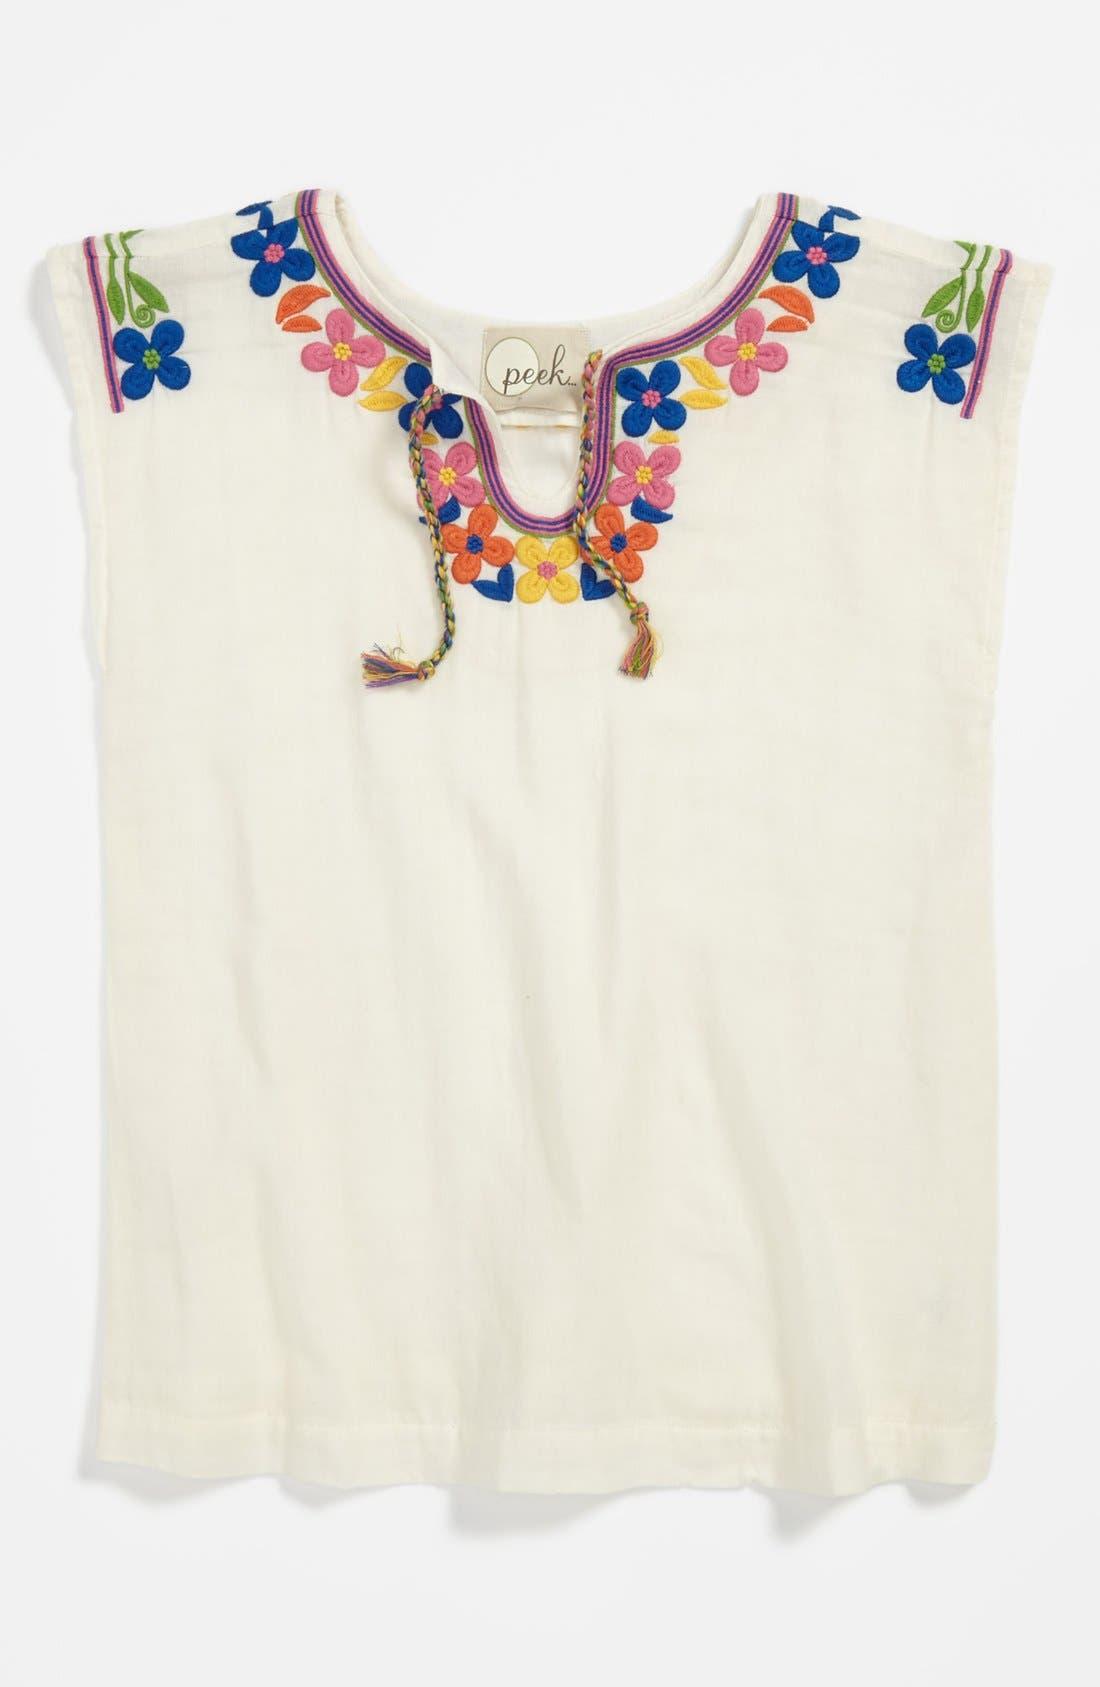 Main Image - Peek Sleeveless Top & Jeans (Toddler Girls, Little Girls & Big Girls)